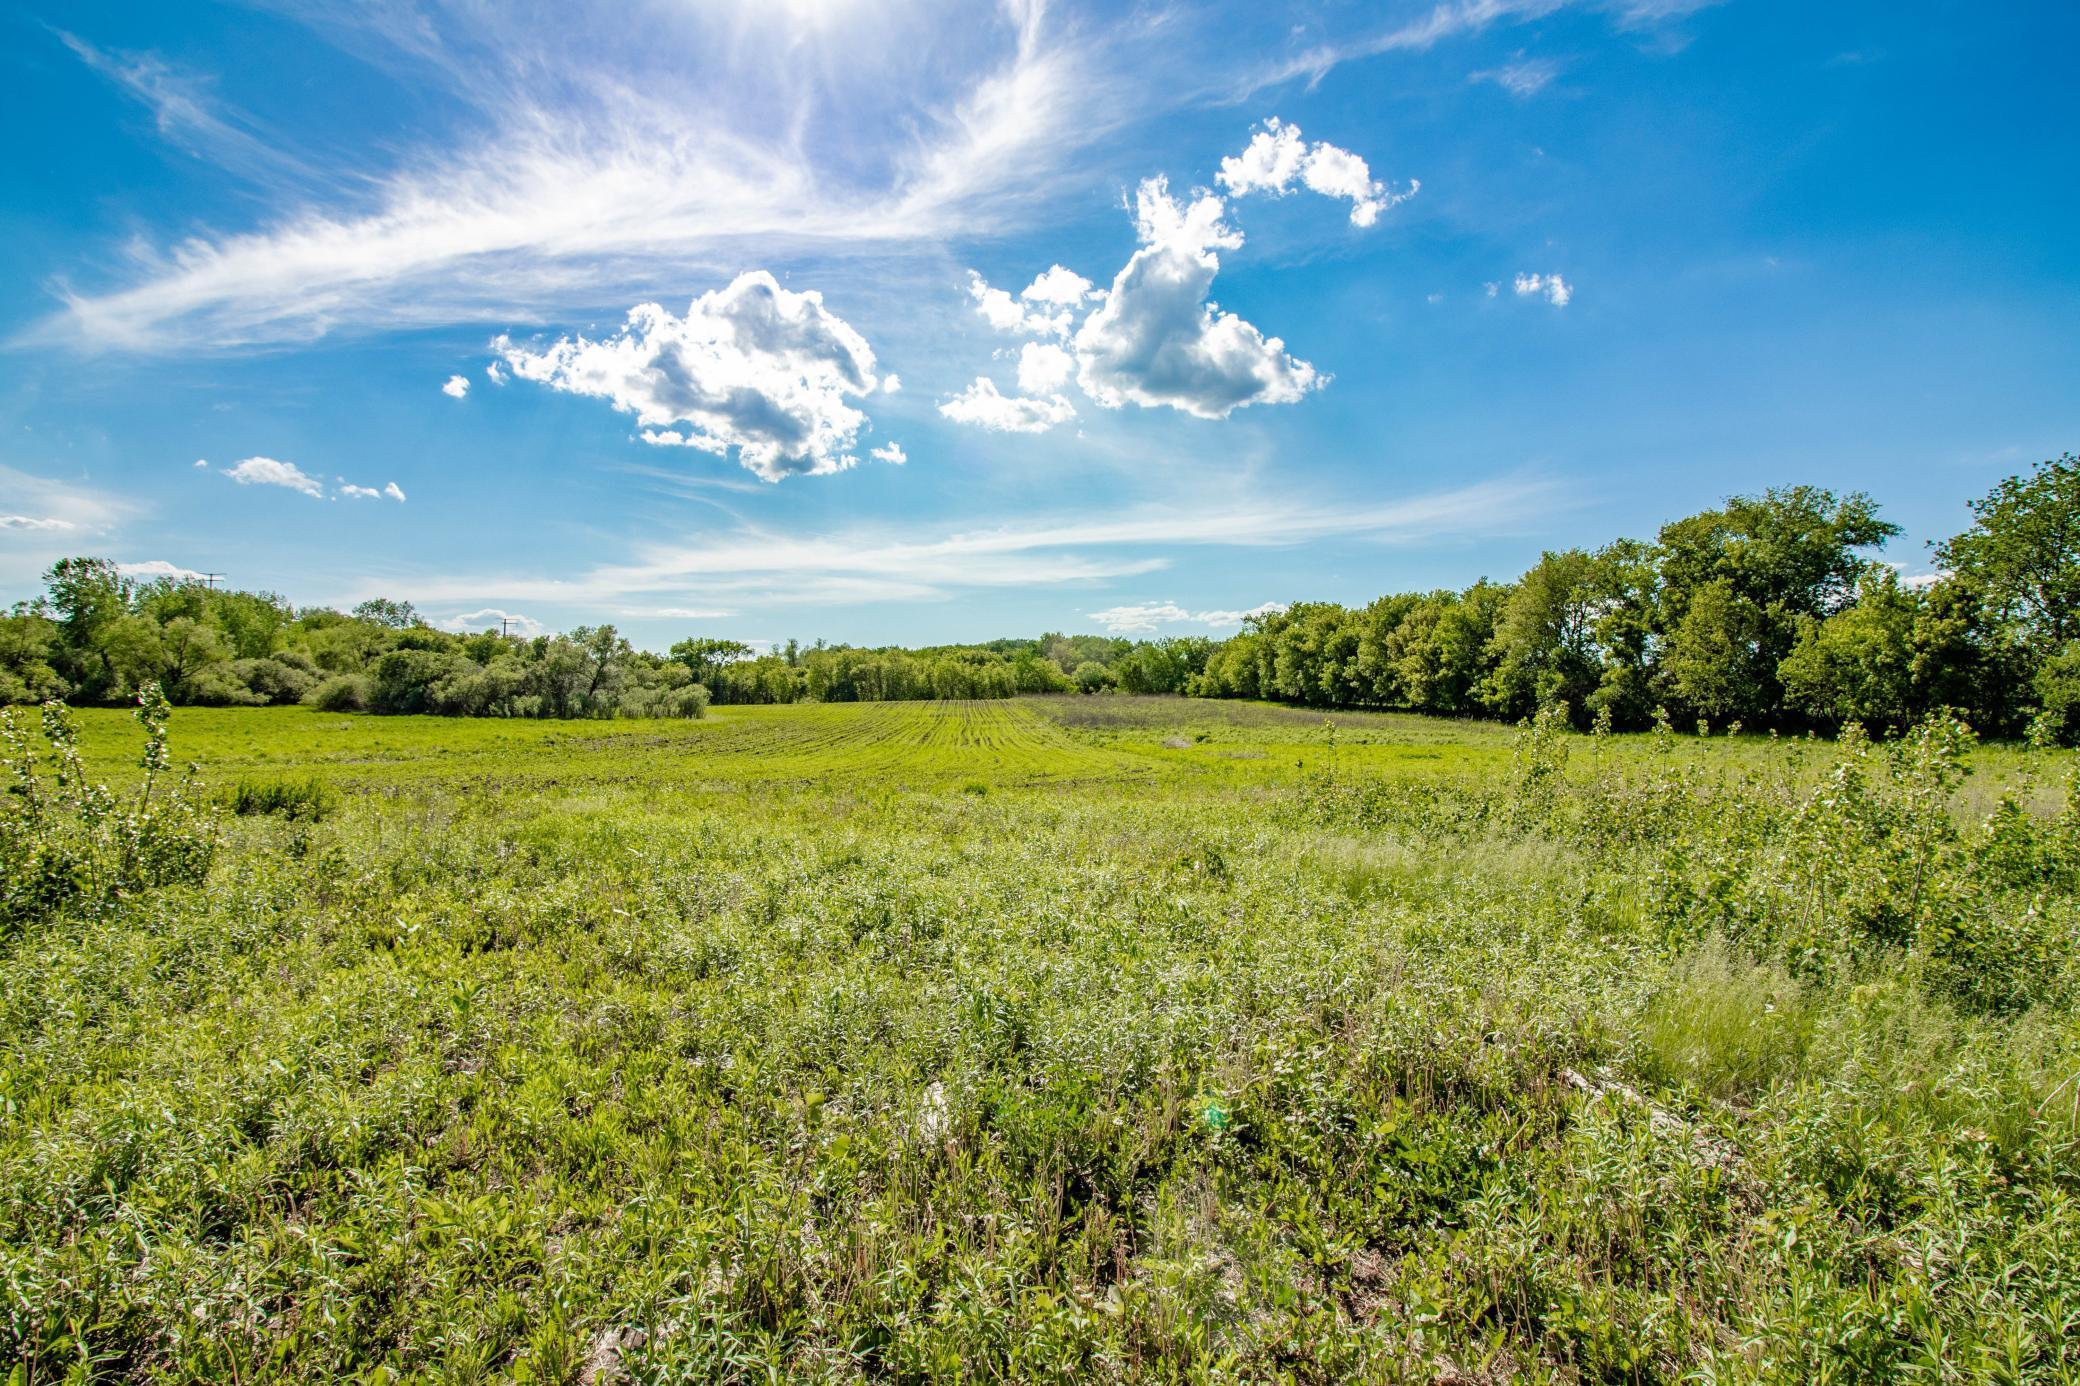 23700 Fairgreen Avenue Property Photo - Eureka Twp, MN real estate listing